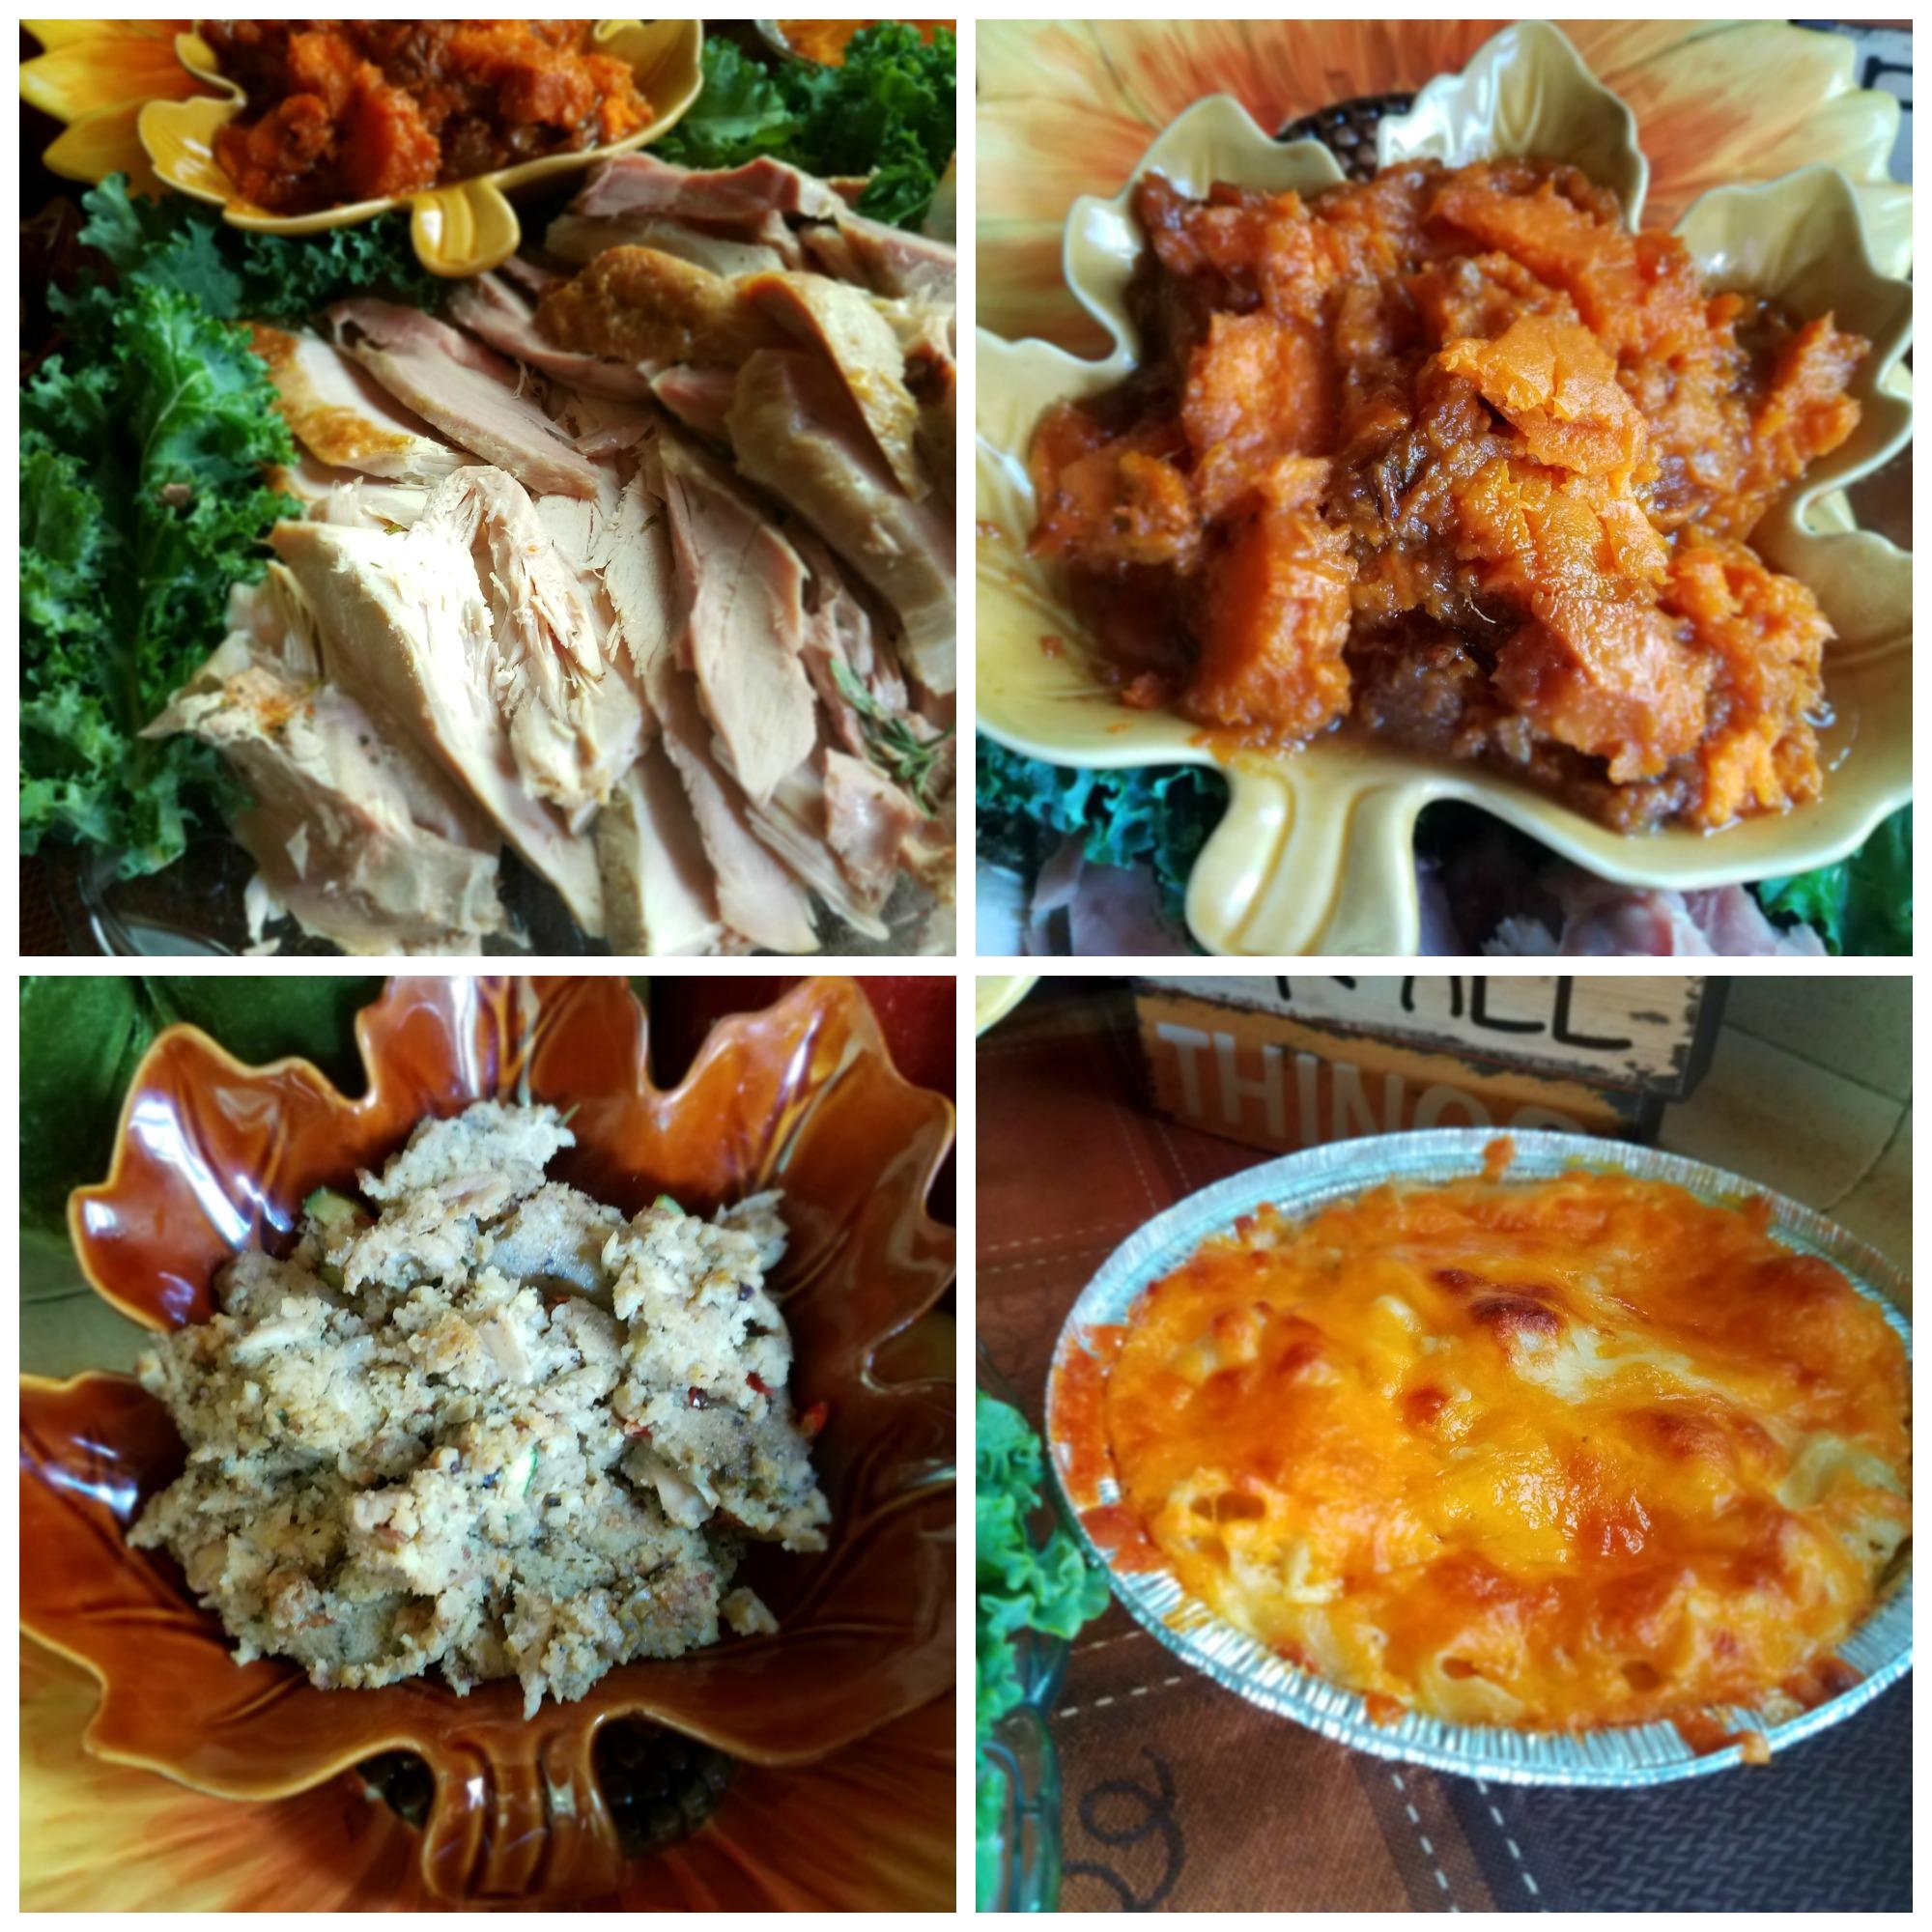 Thanksgiving Dinner Collard Greens And Caviar